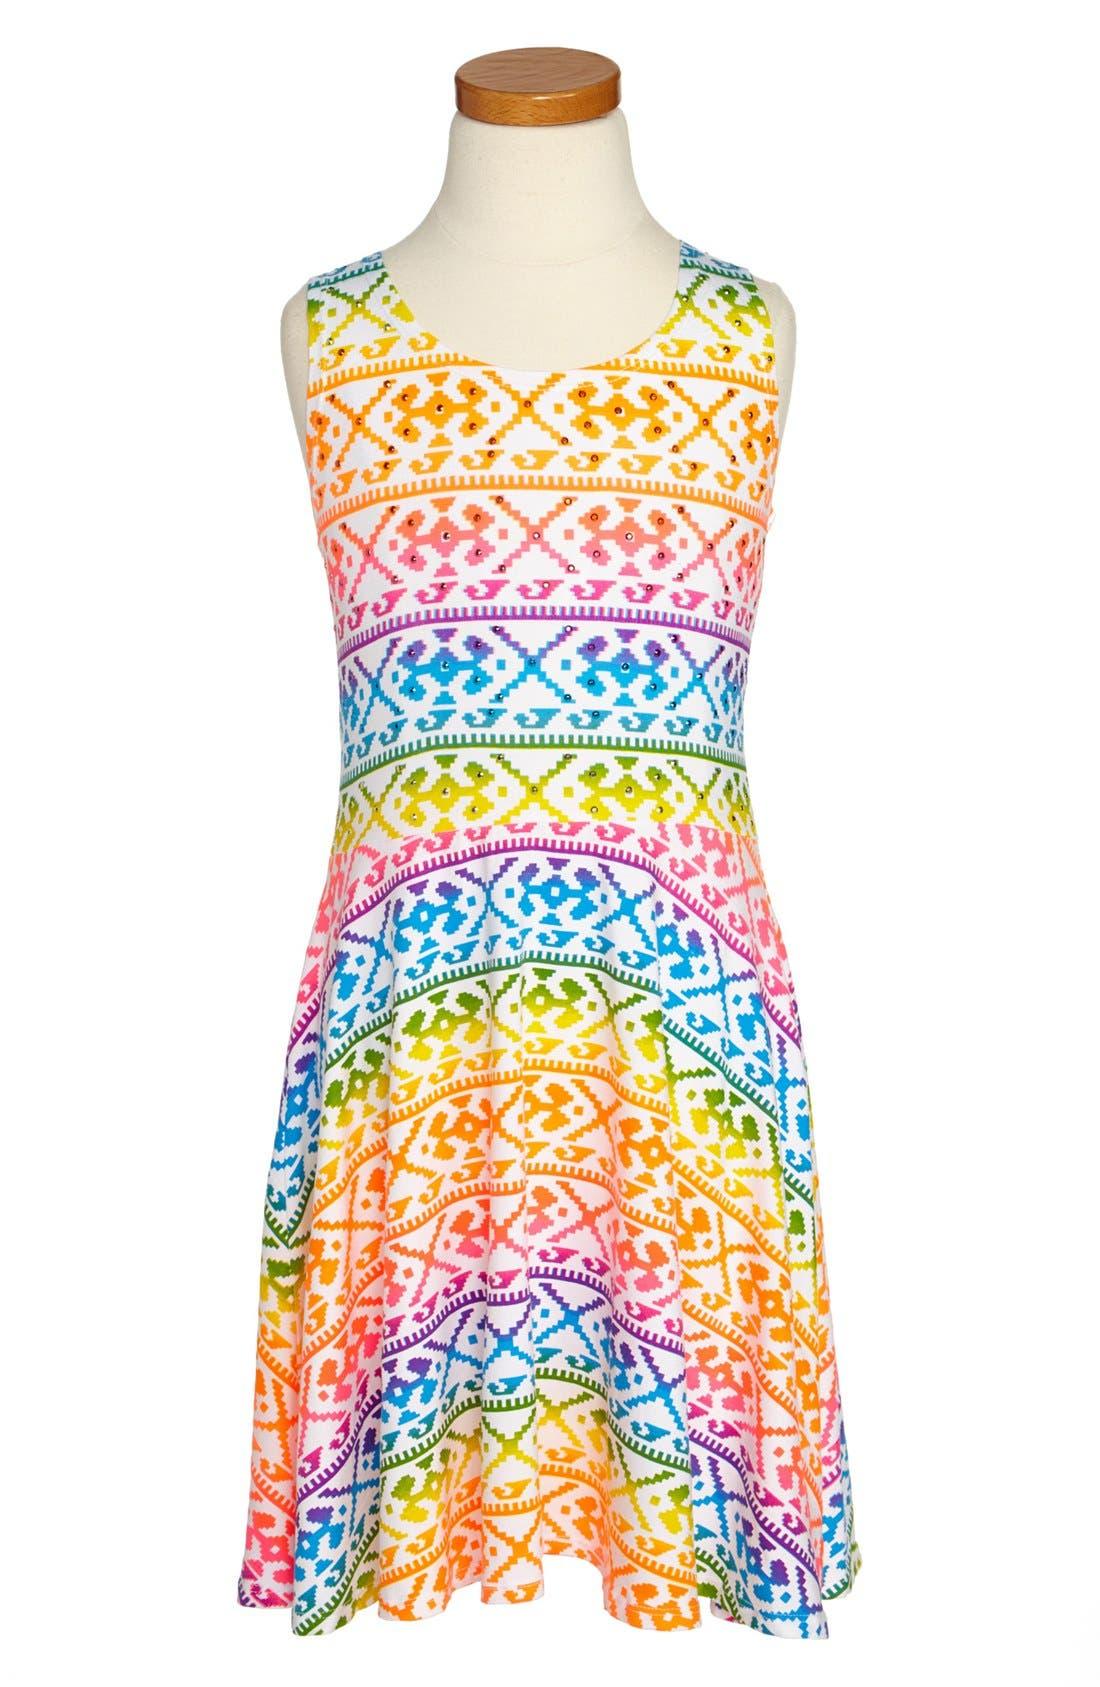 Alternate Image 1 Selected - Flowers by Zoe Print Dress (Little Girls)